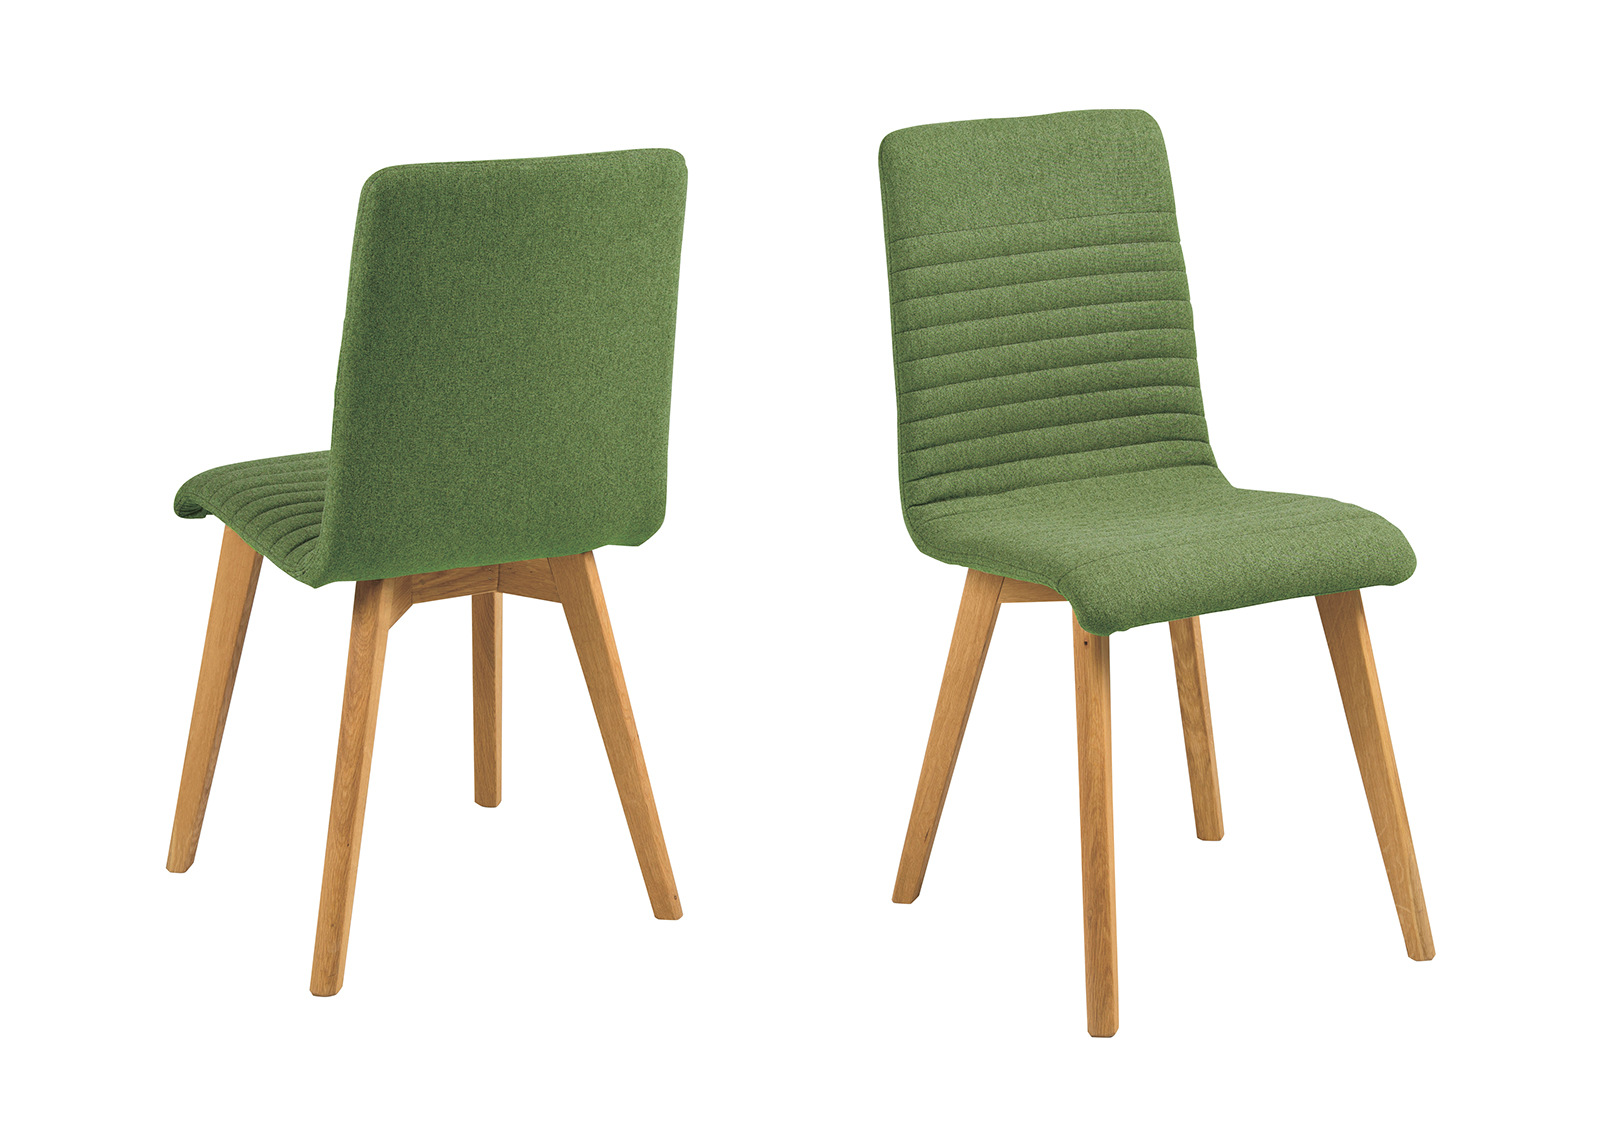 Tuolit AROSA, 2 kpl